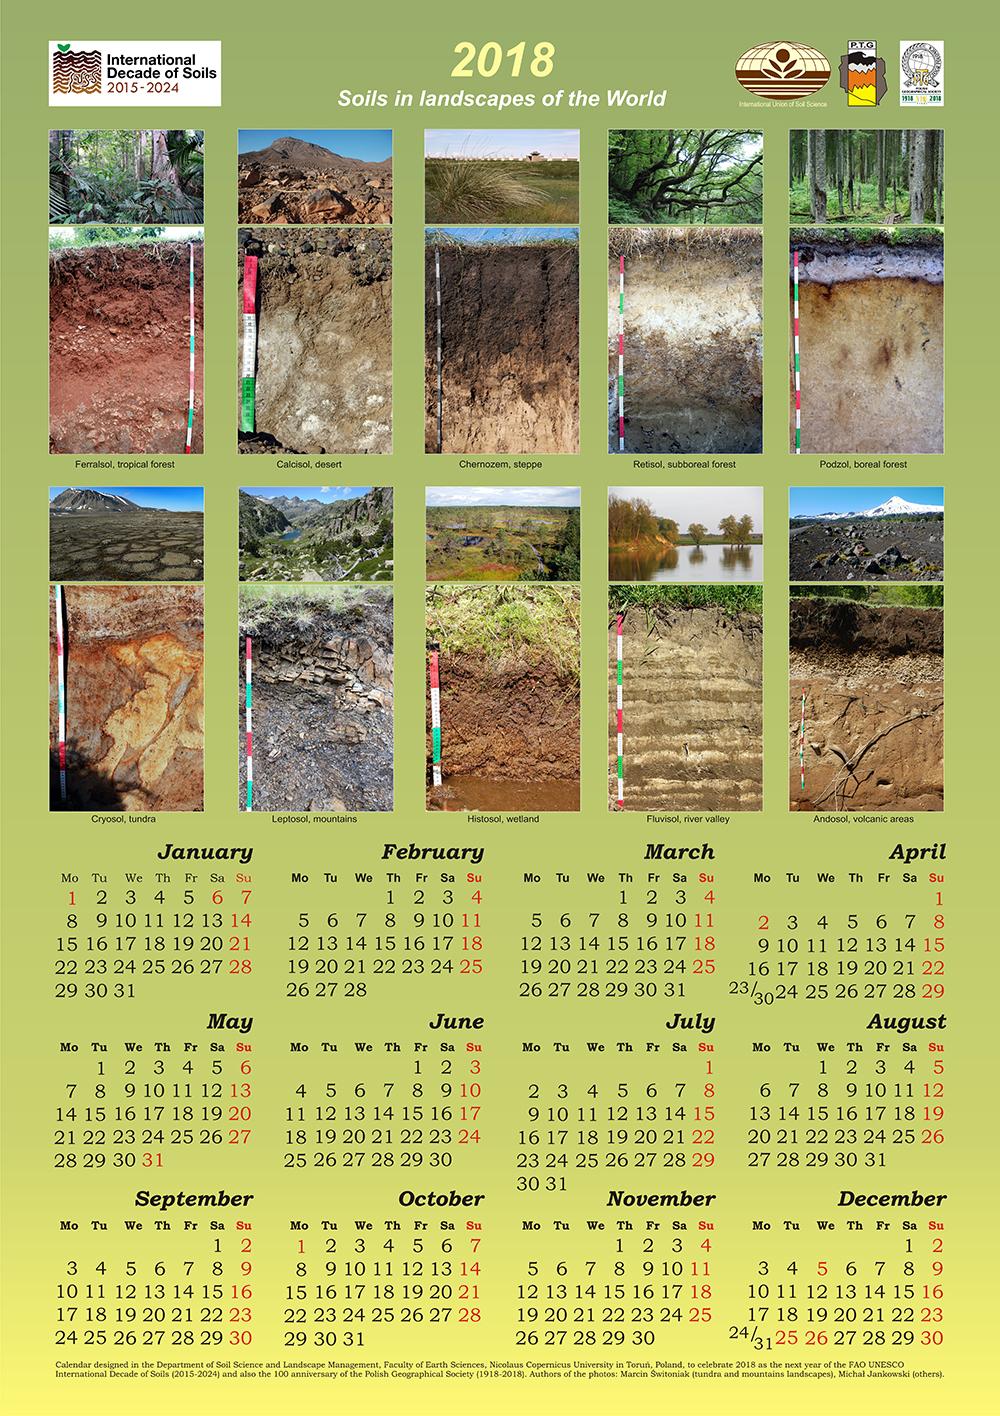 Kalendarz na rok 2018 – Gleby Świata